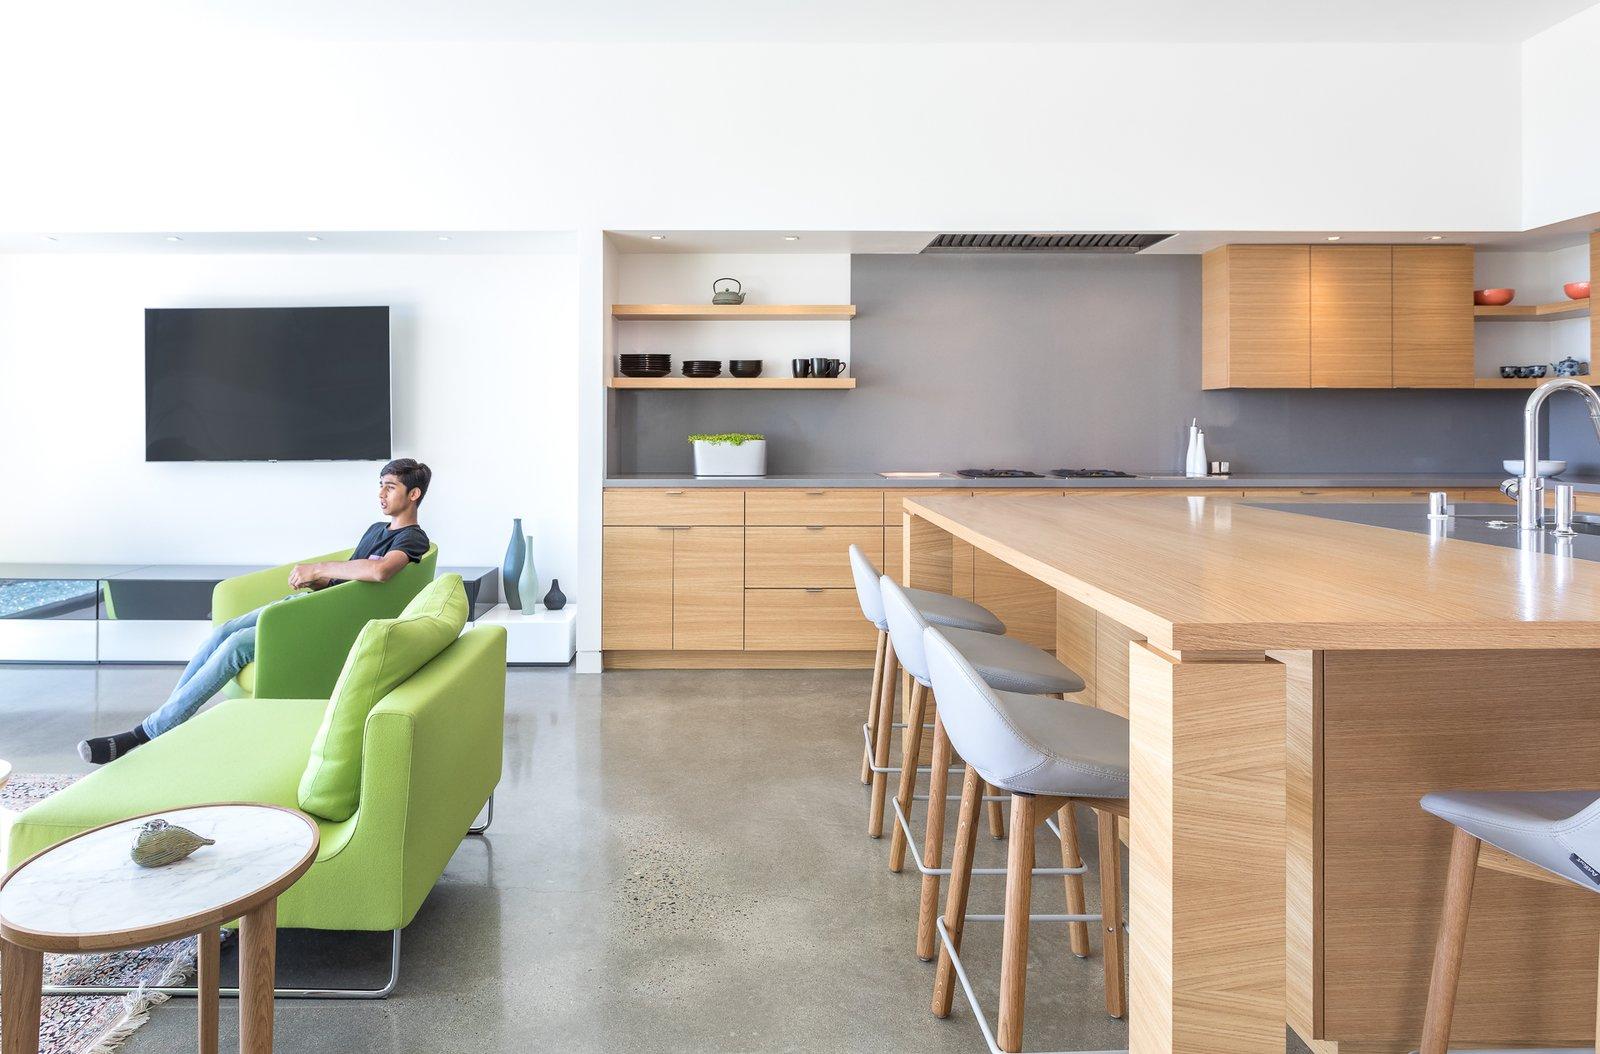 Kitchen, Undermount, Cooktops, Range Hood, Concrete, Engineered Quartz, Wood, and Recessed  Best Kitchen Cooktops Recessed Range Hood Concrete Photos from Folsom